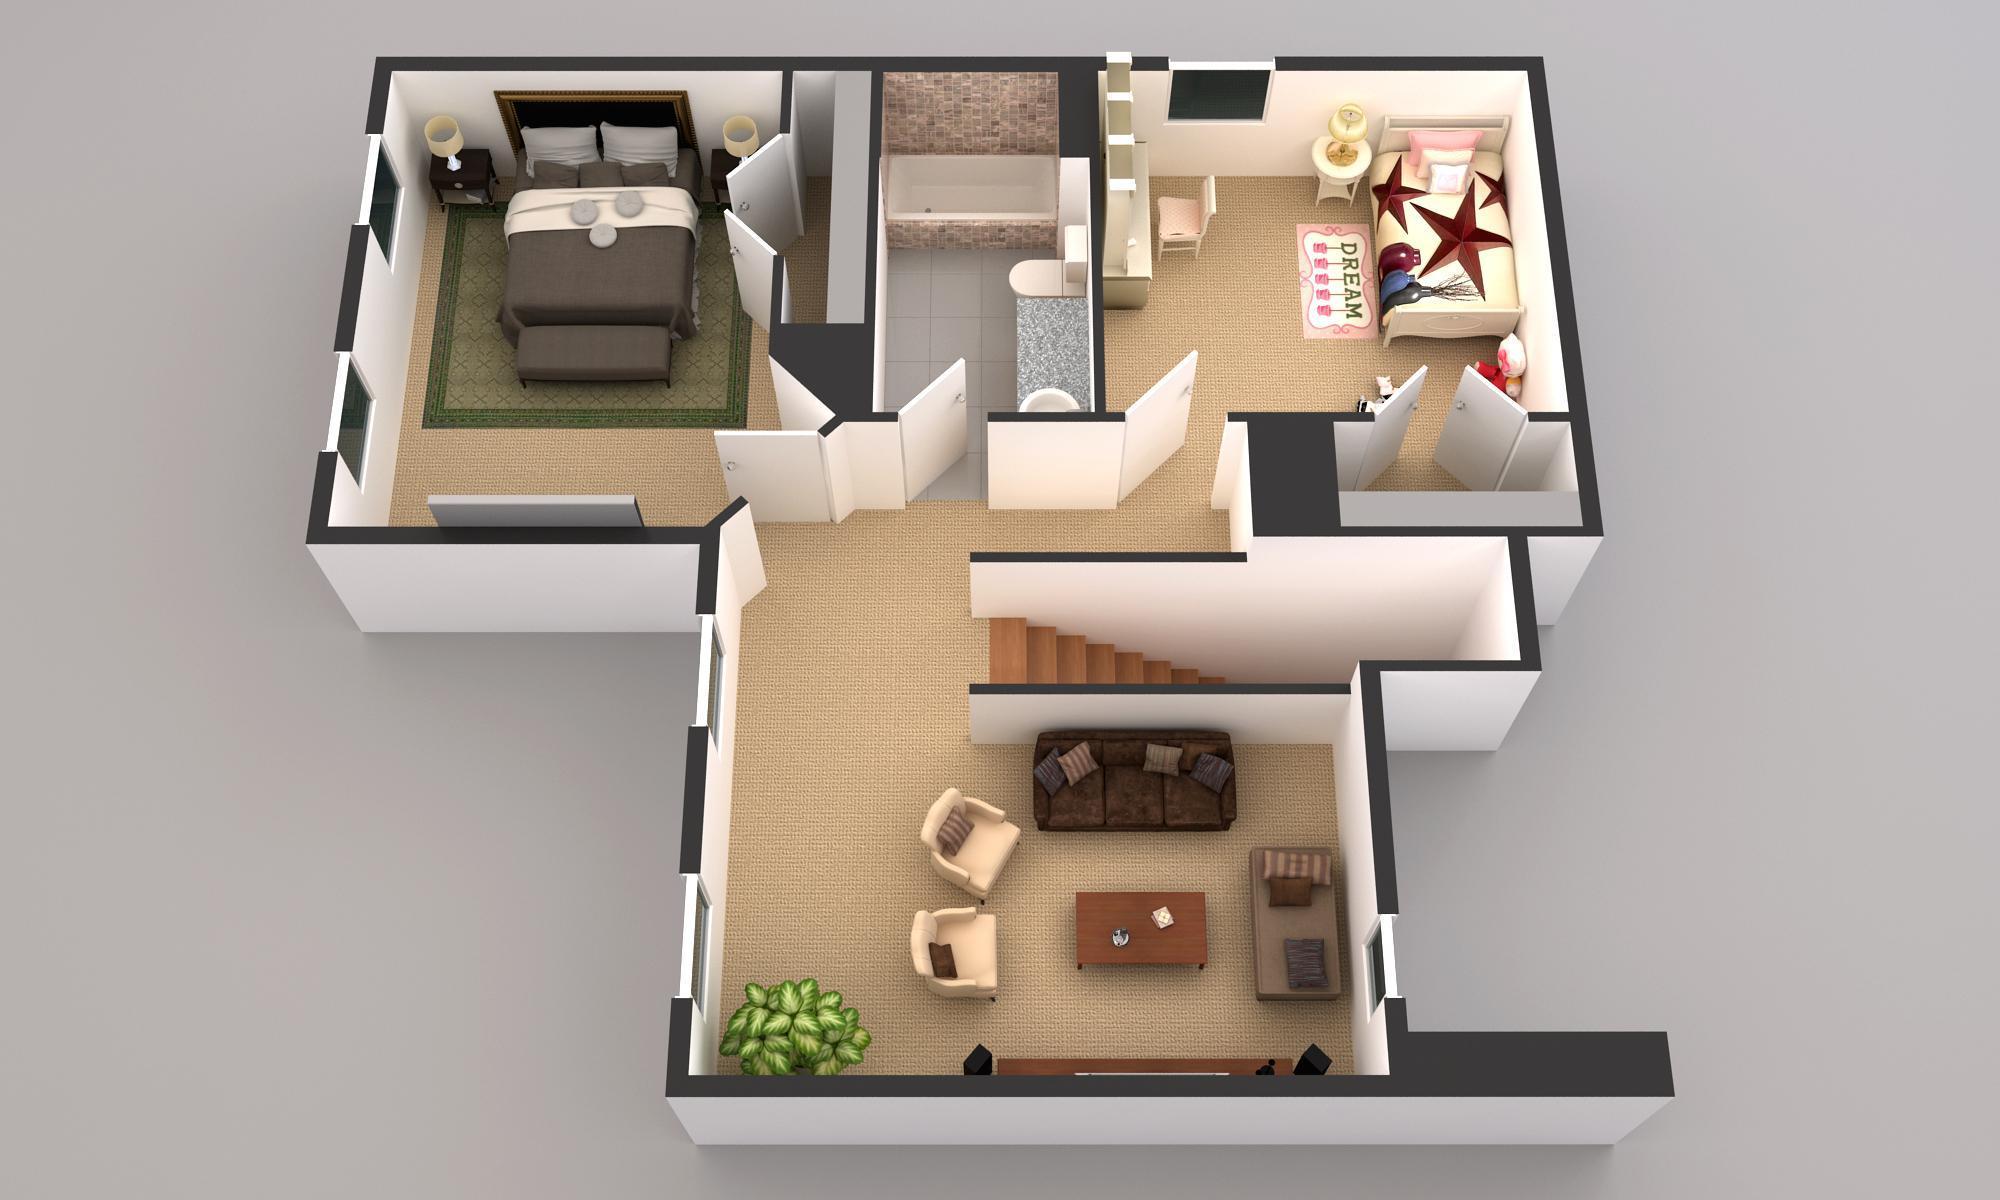 http://partners-dynamic.bdxcdn.com/Images/Homes/GoodallHomebuilder/max1500_27739133-180524.jpg